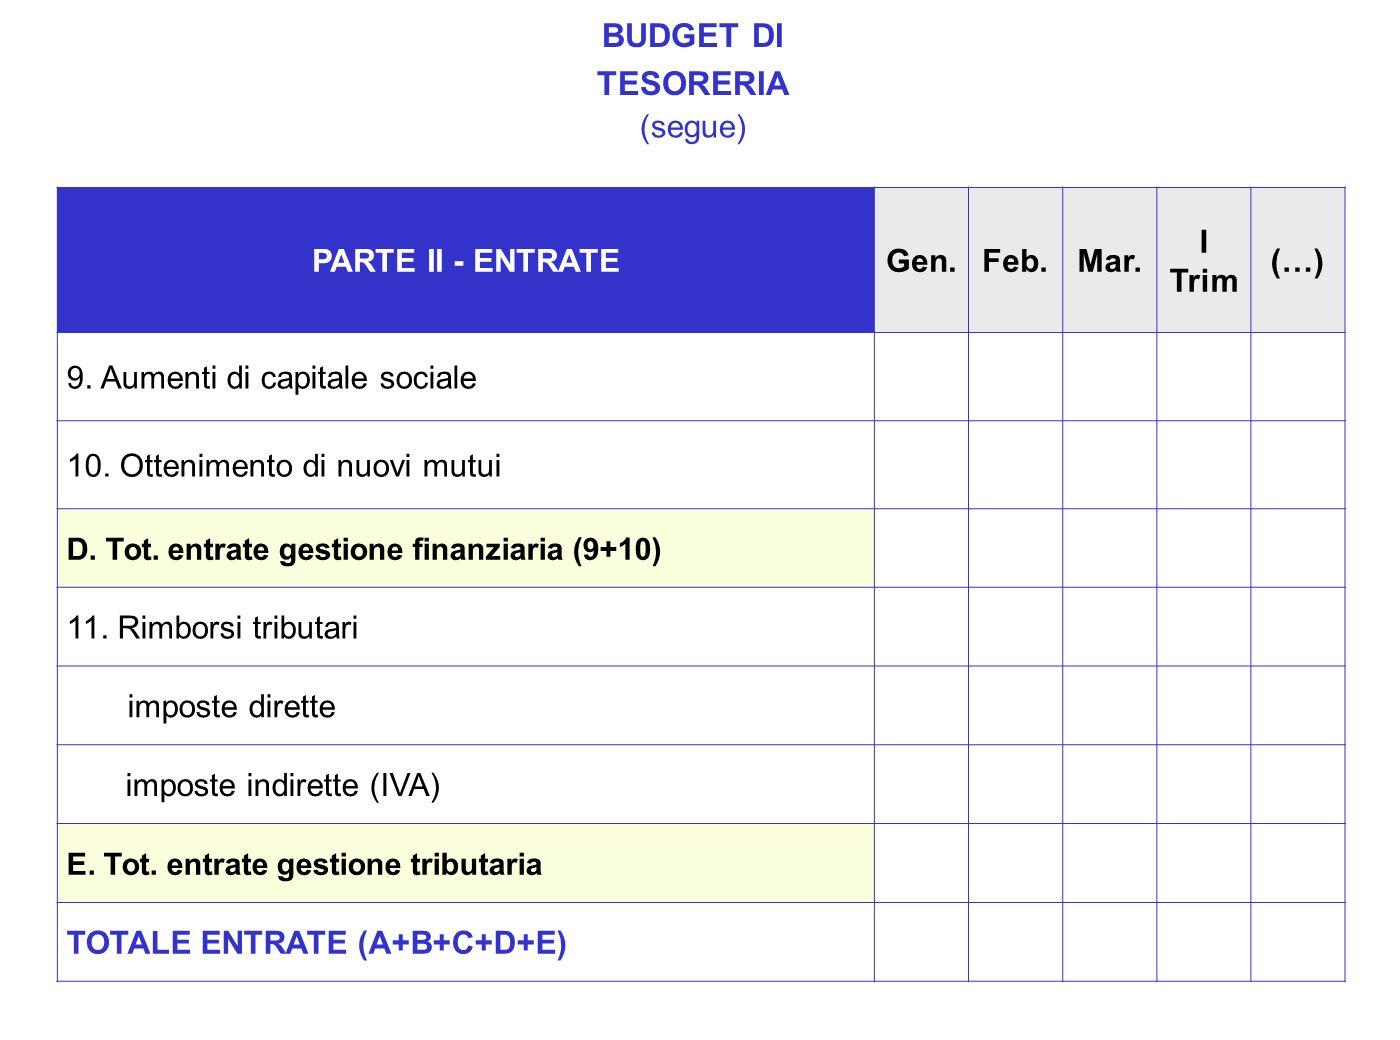 PARTE II - ENTRATEGen.Feb.Mar. I Trim (…) 9. Aumenti di capitale sociale 10. Ottenimento di nuovi mutui D. Tot. entrate gestione finanziaria (9+10) 11